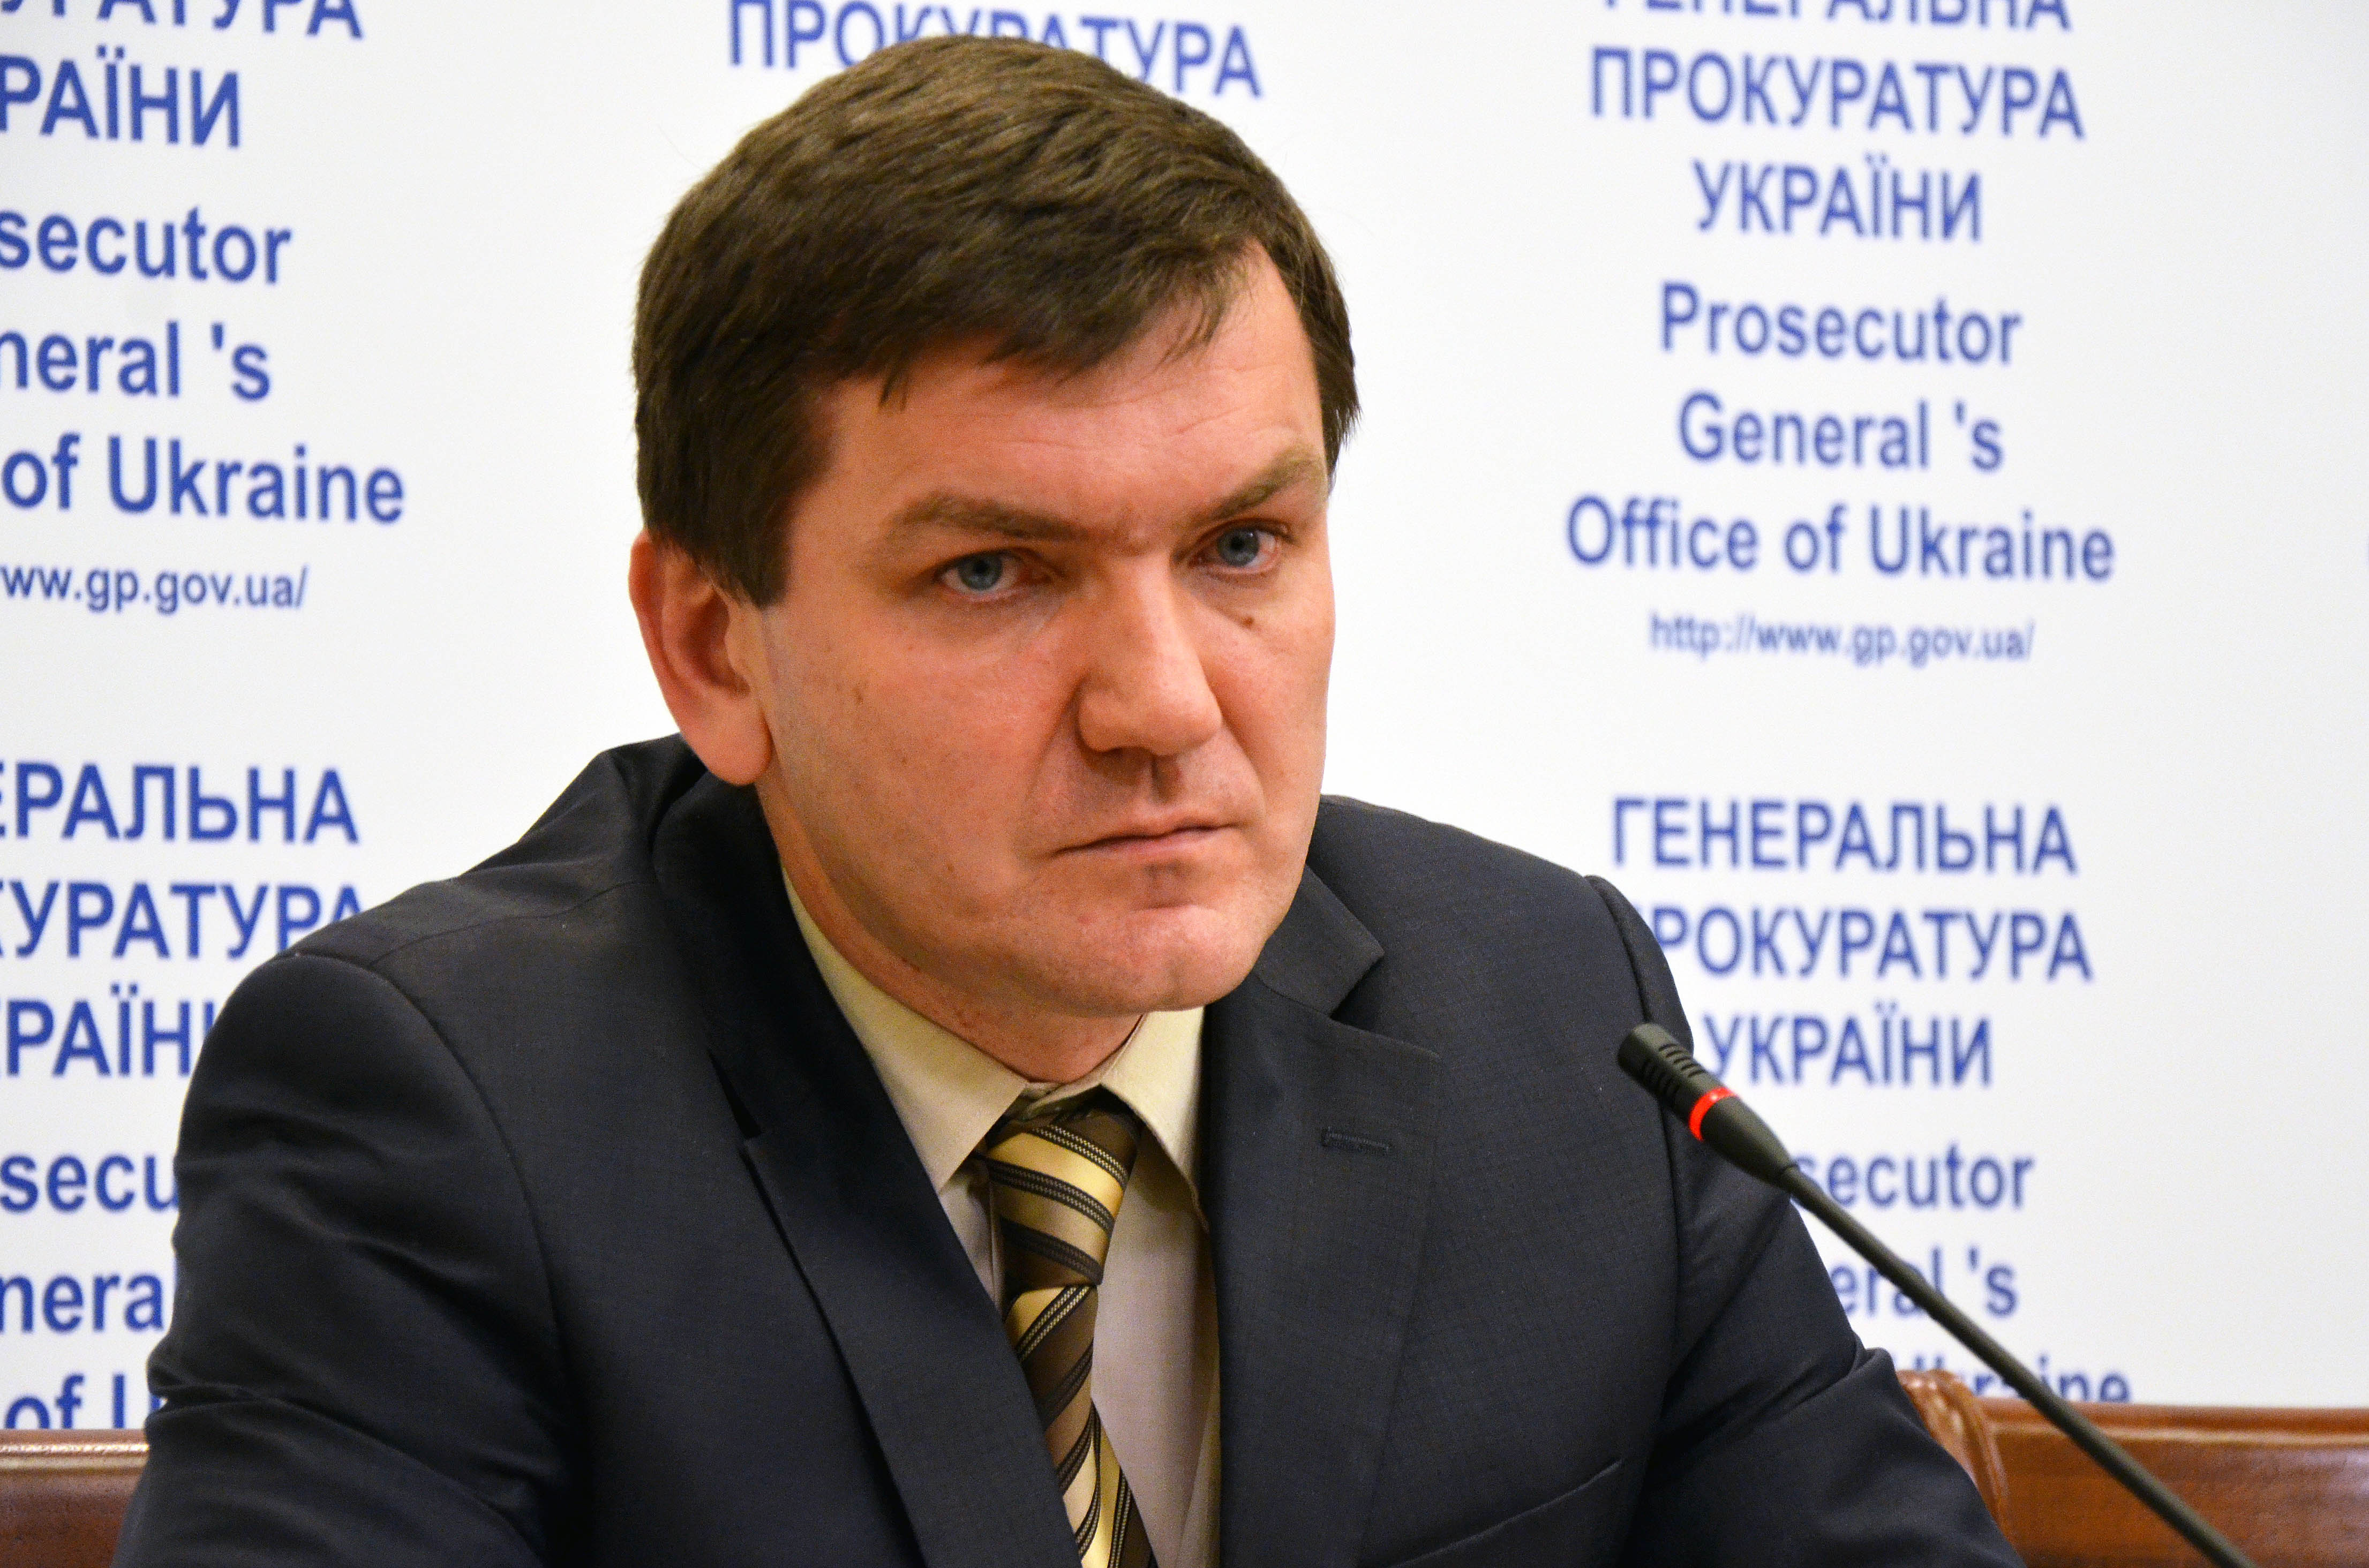 ВГПУ поведали, очем допрашивали Вороненкова